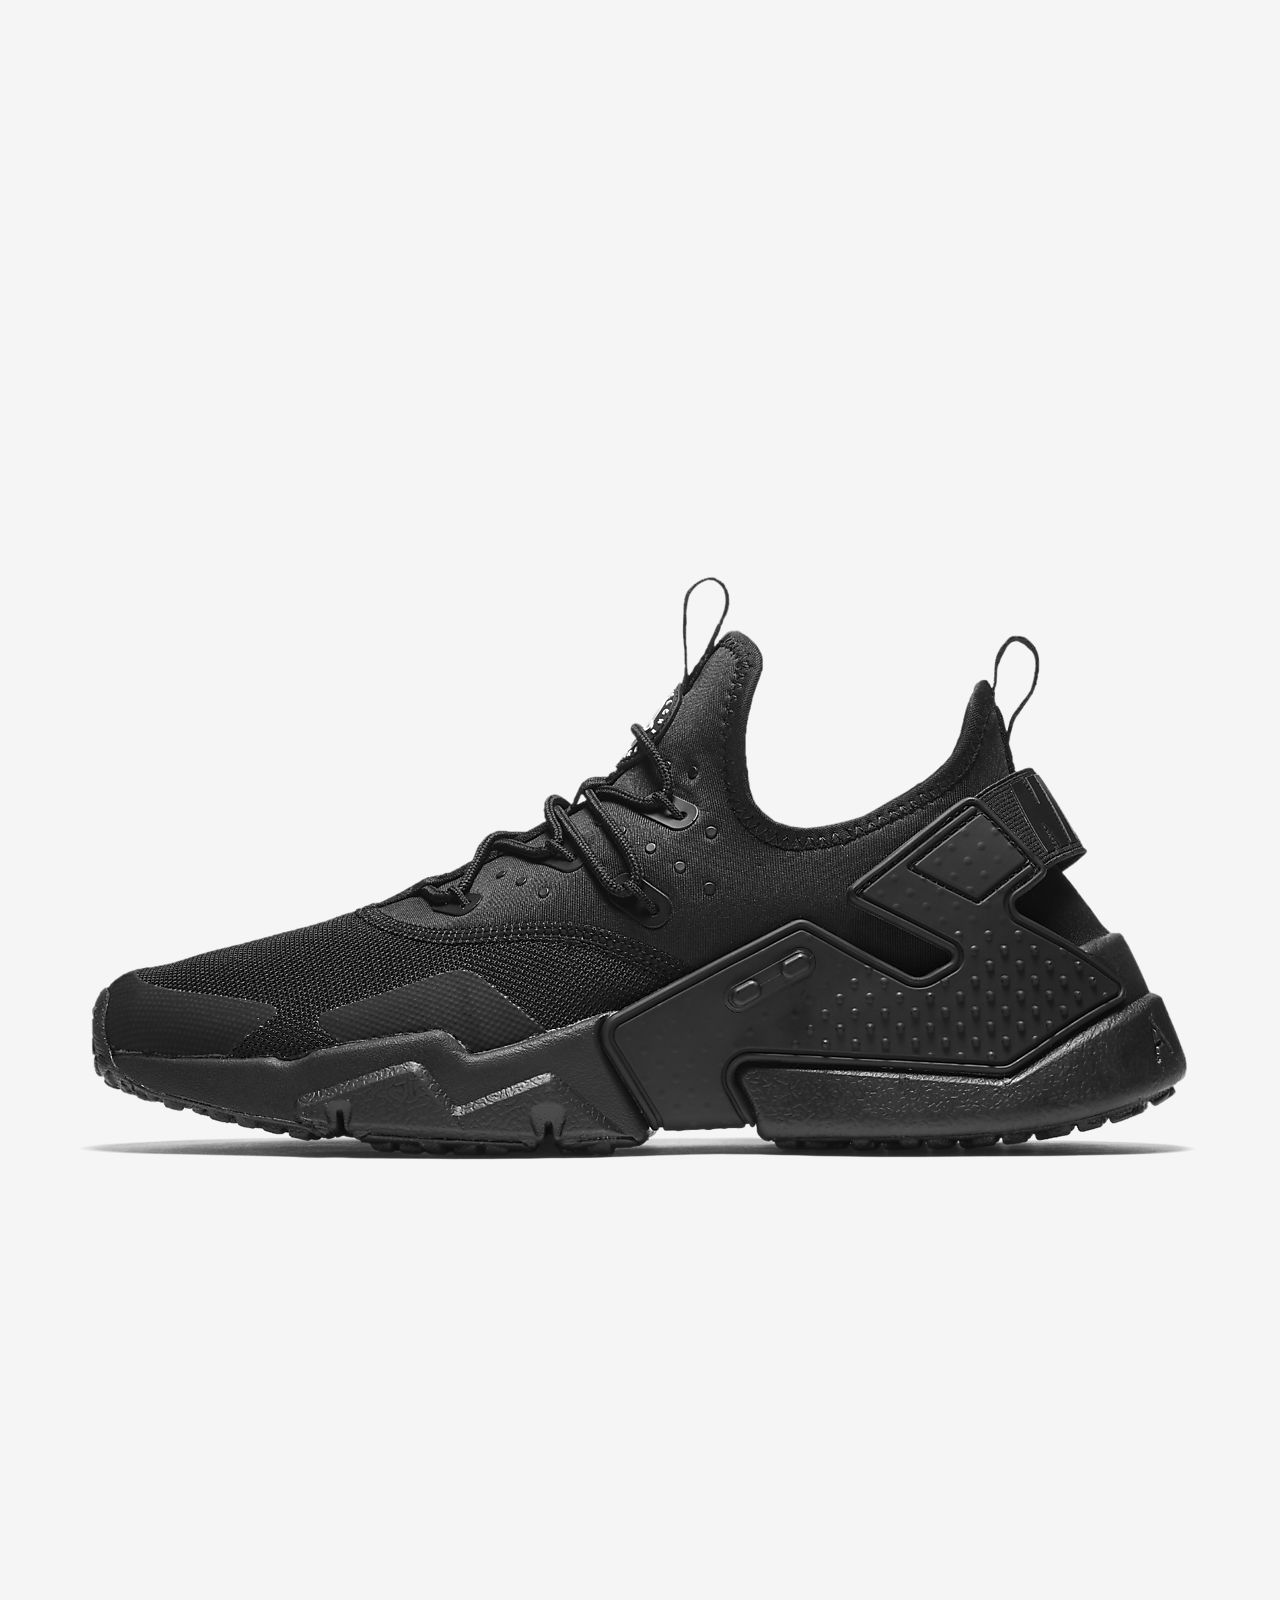 premium selection 6754d 22575 Chaussure Nike Air Huarache Drift pour Homme ...